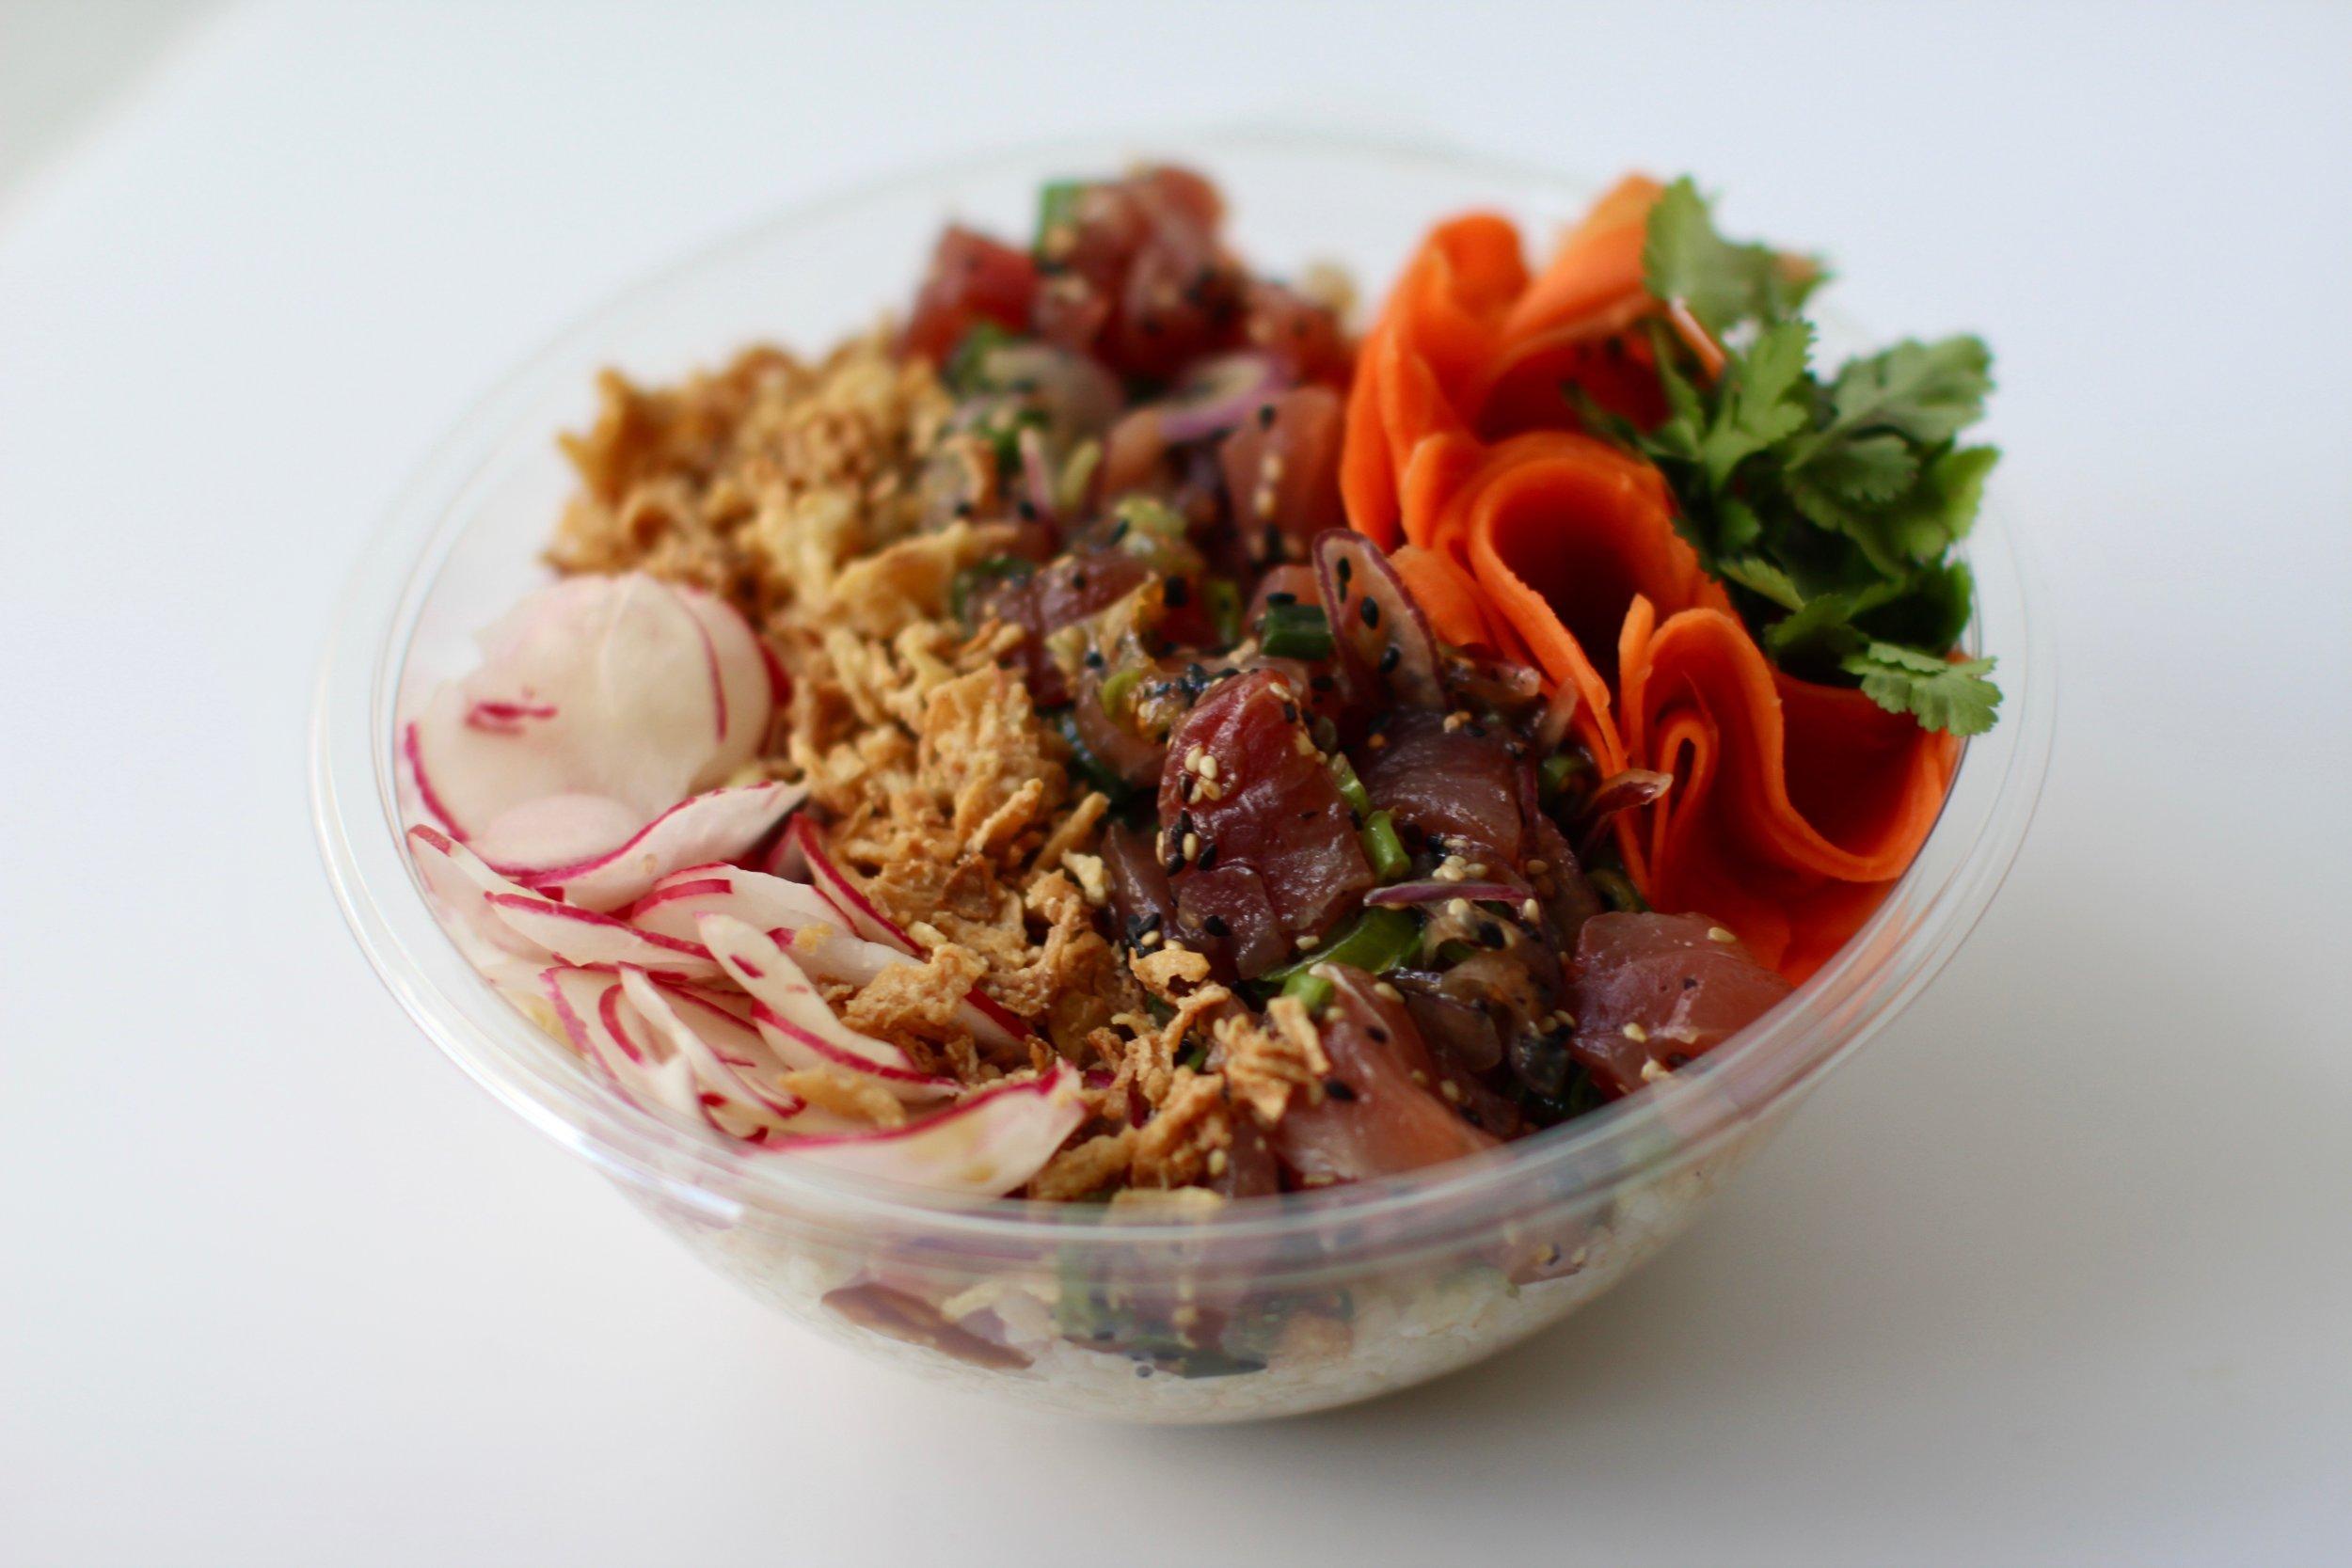 Oahu - Brown Rice, Ahi Tuna, Red Onion, Fried Onion, Raddish, Carrot, CorianderSesame Shoyu (GF,DF)